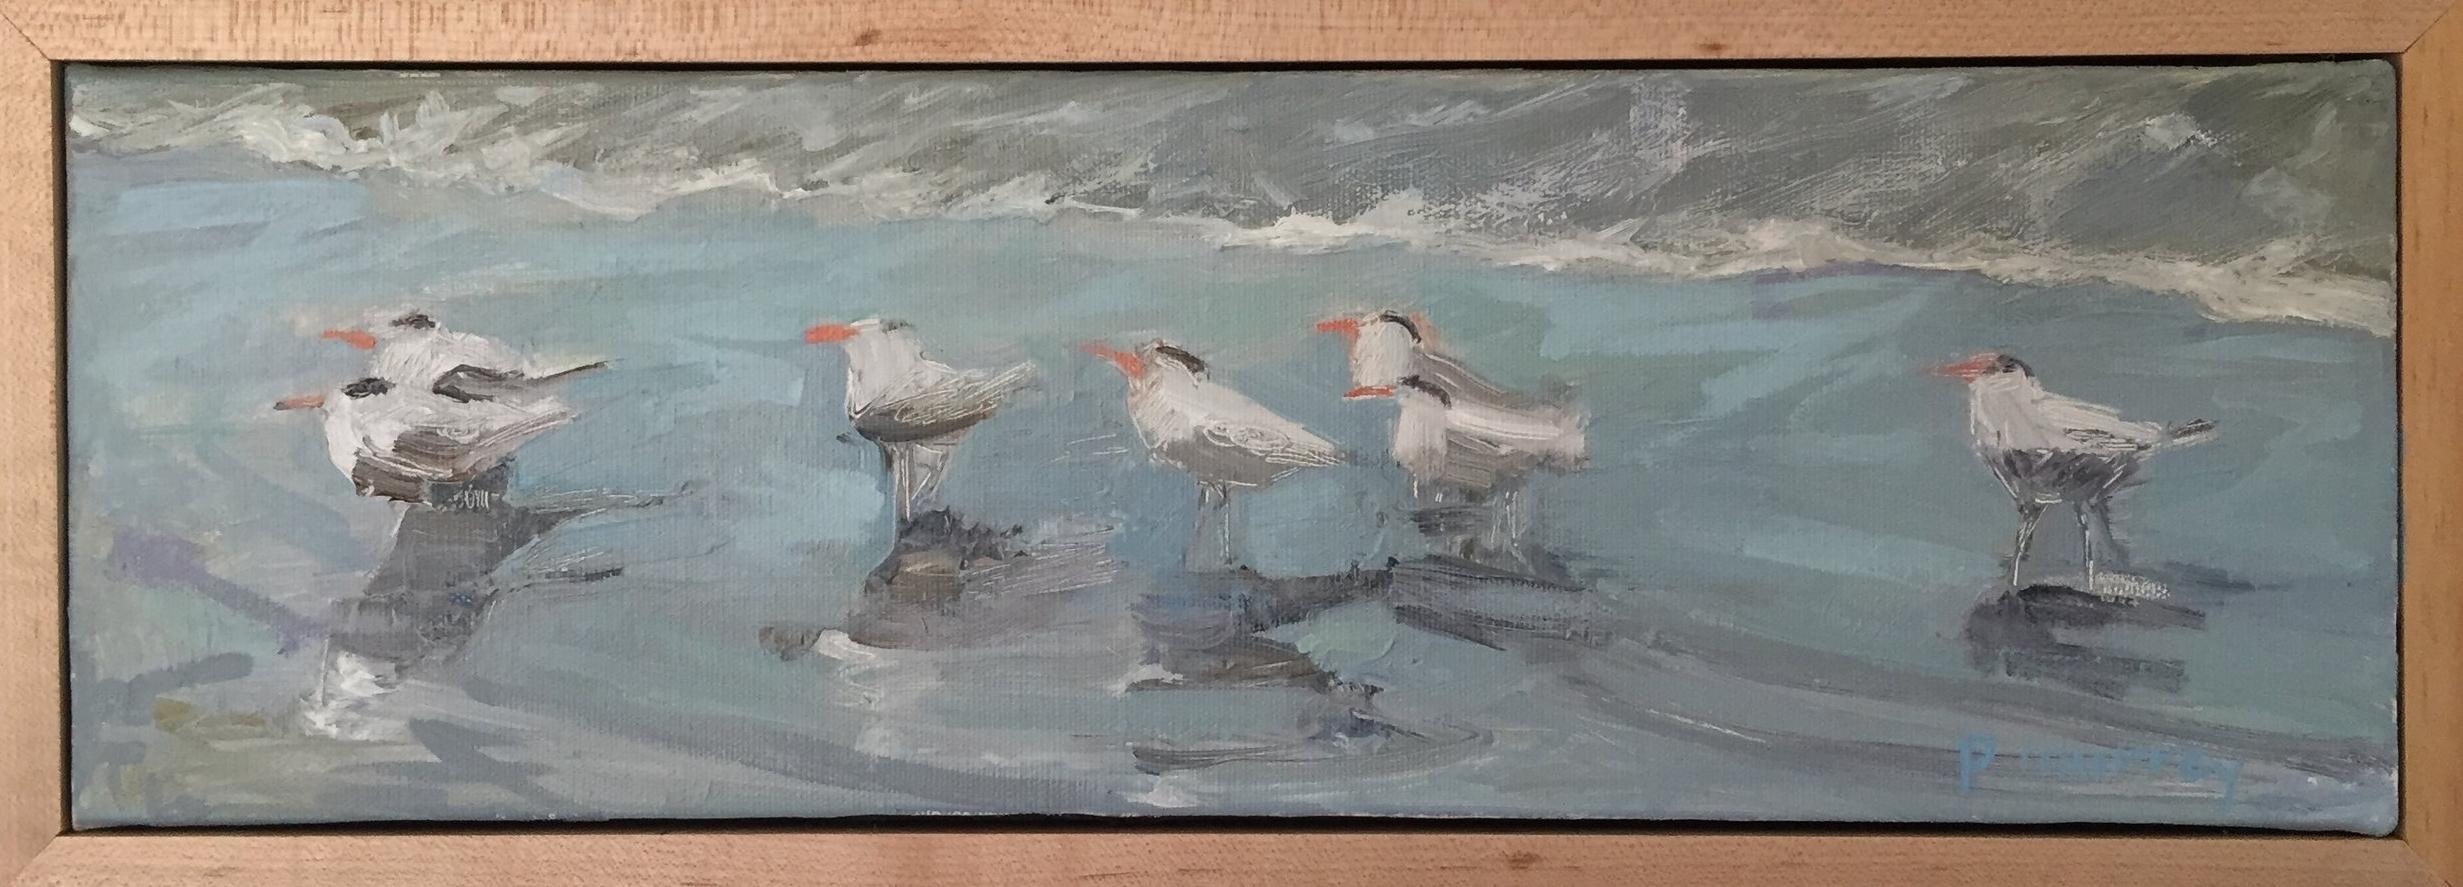 Caspian Terns at Rest